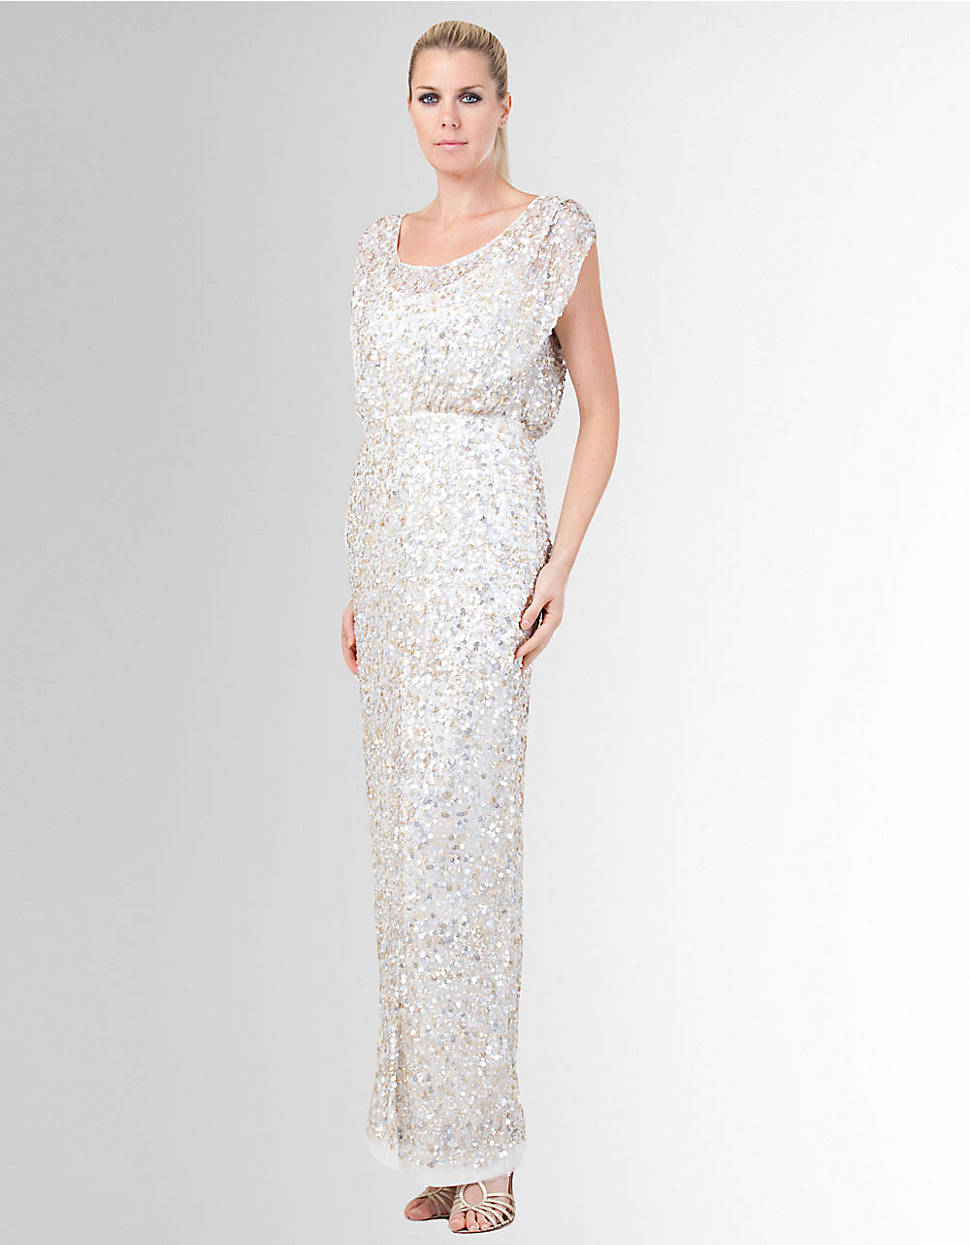 Evening Halter Dresses + Js Collection - Cheap Party Dresses